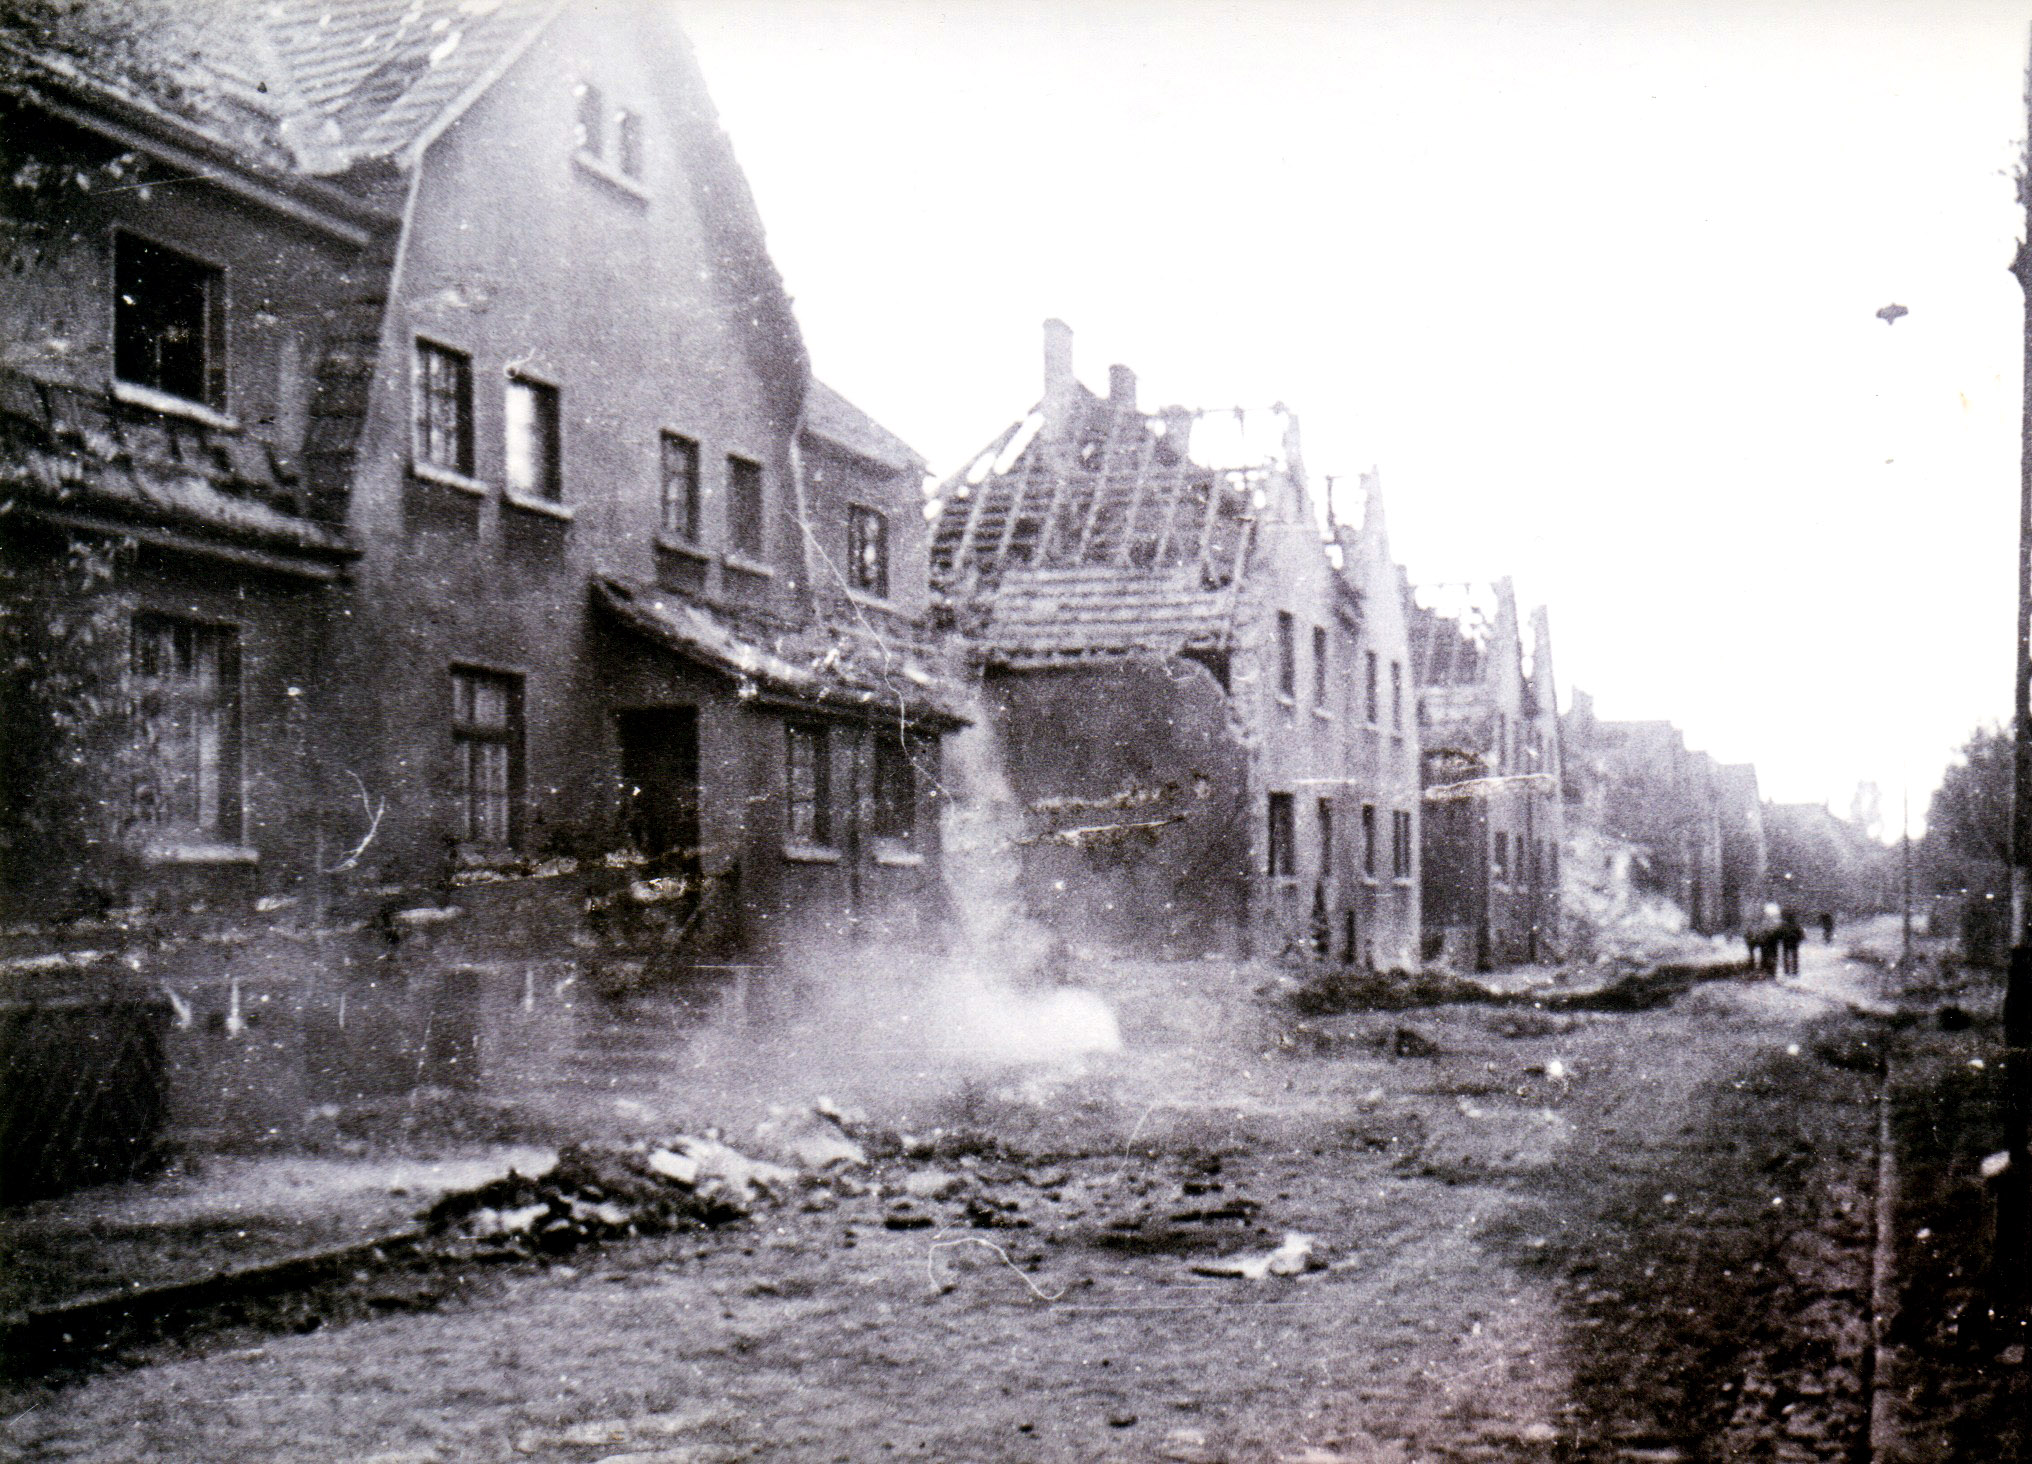 Die Lakestrasse in Ickern nach dem Bombenangriff vom 02.11.1944